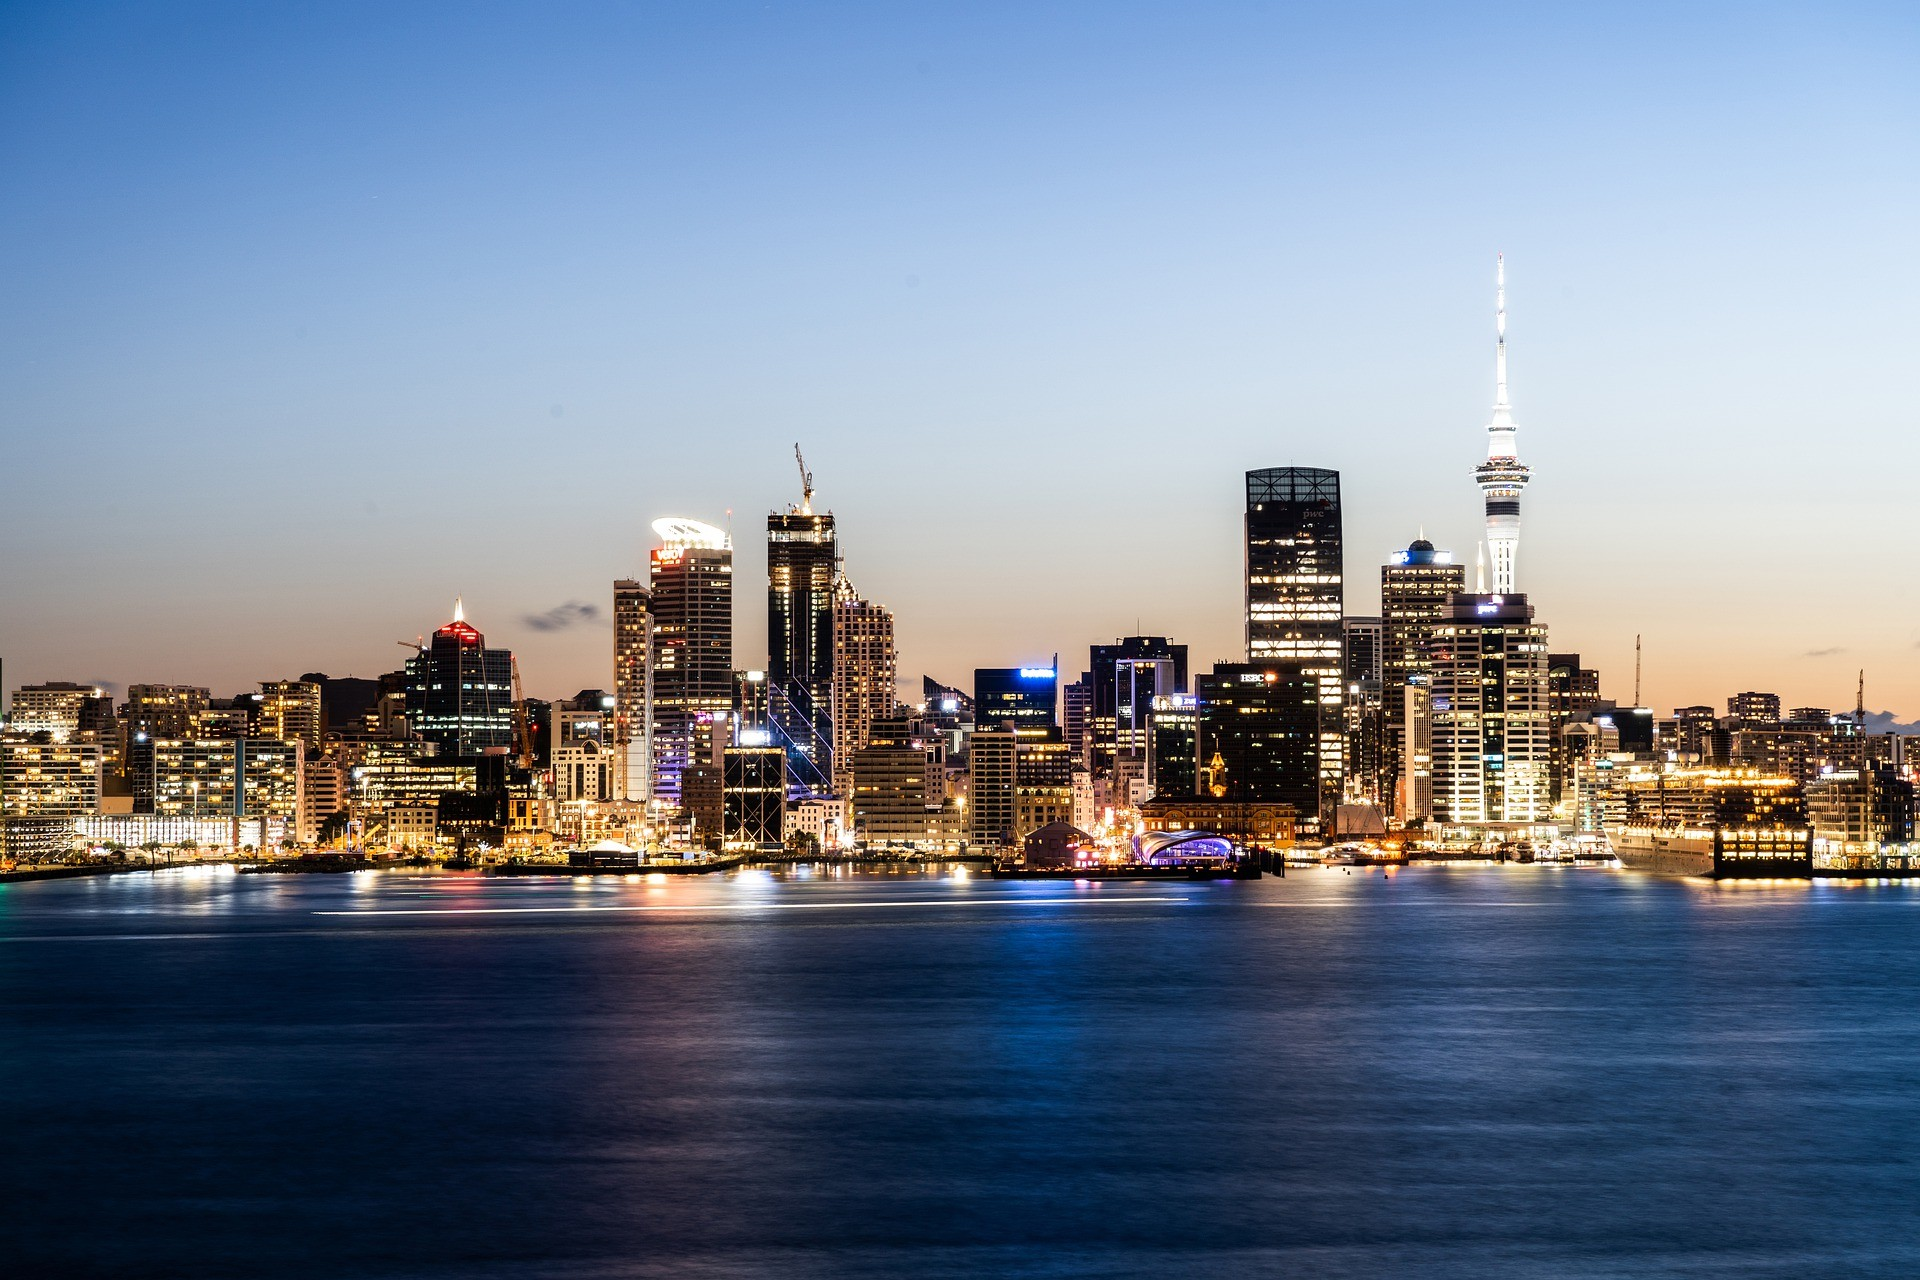 ciudades-mas-habitales-mundo-1-alt